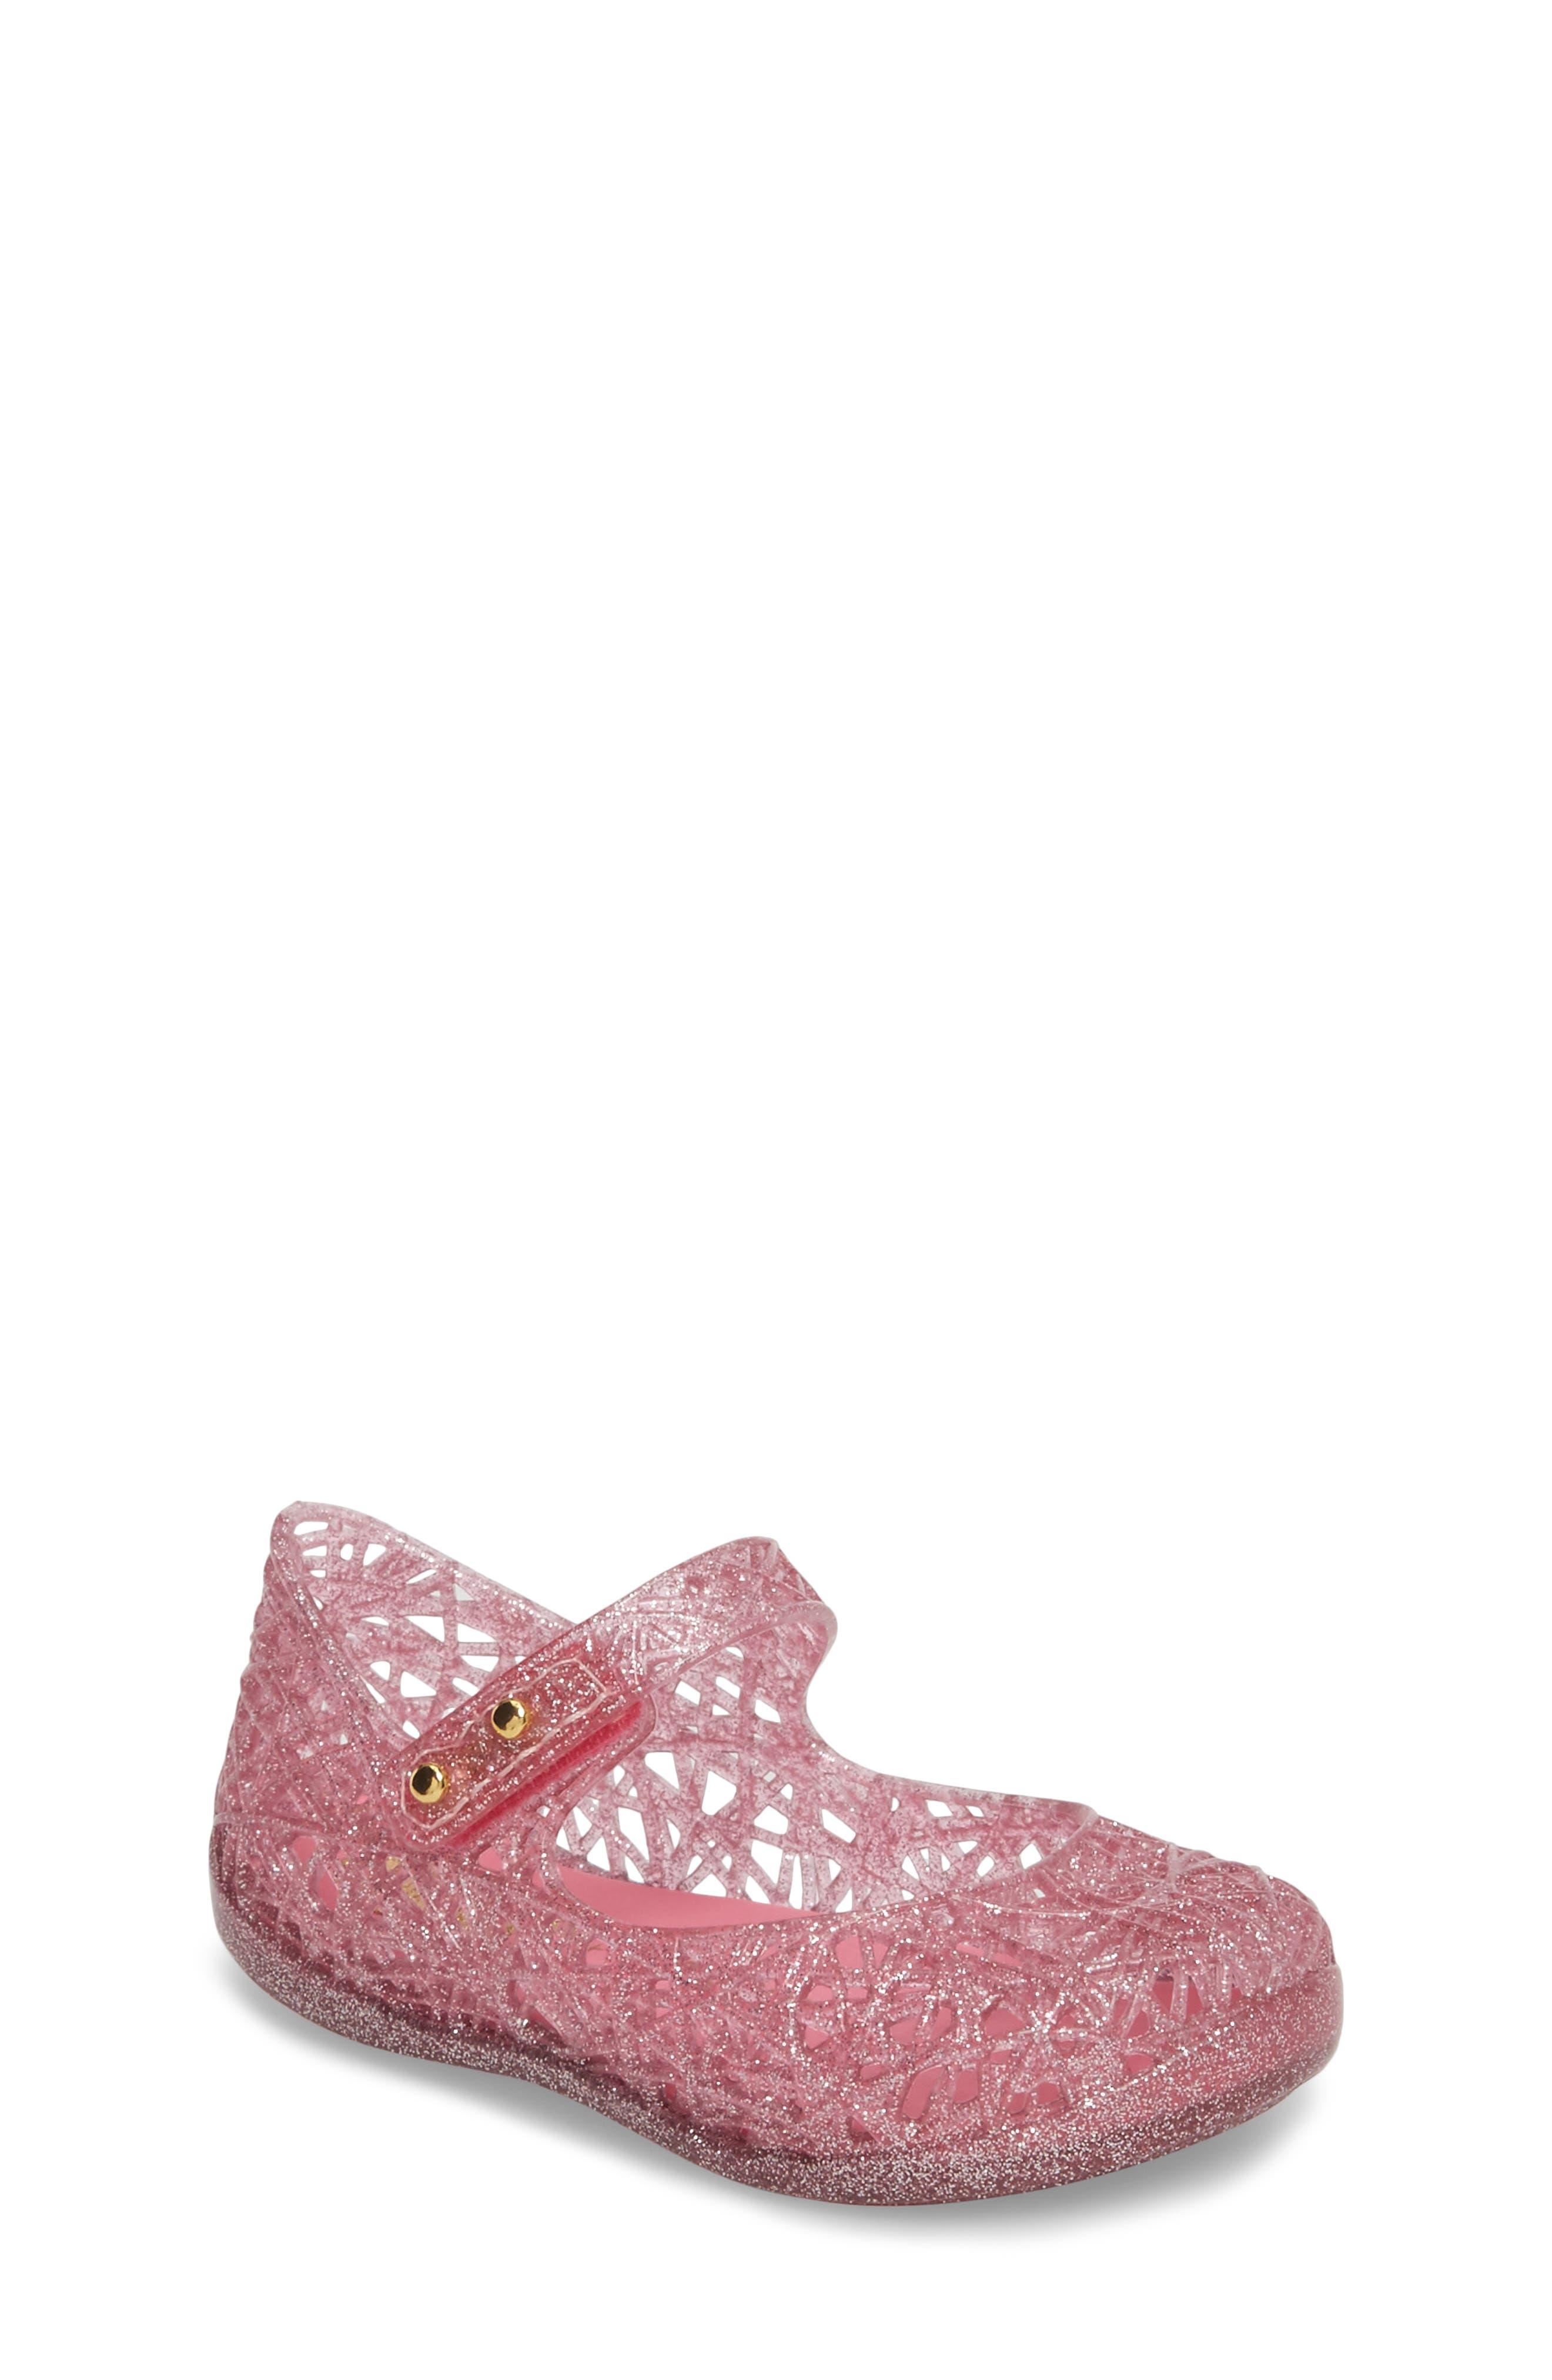 MINI MELISSA Campana Mary Jane Flat, Main, color, PINK/PINK GLITTER